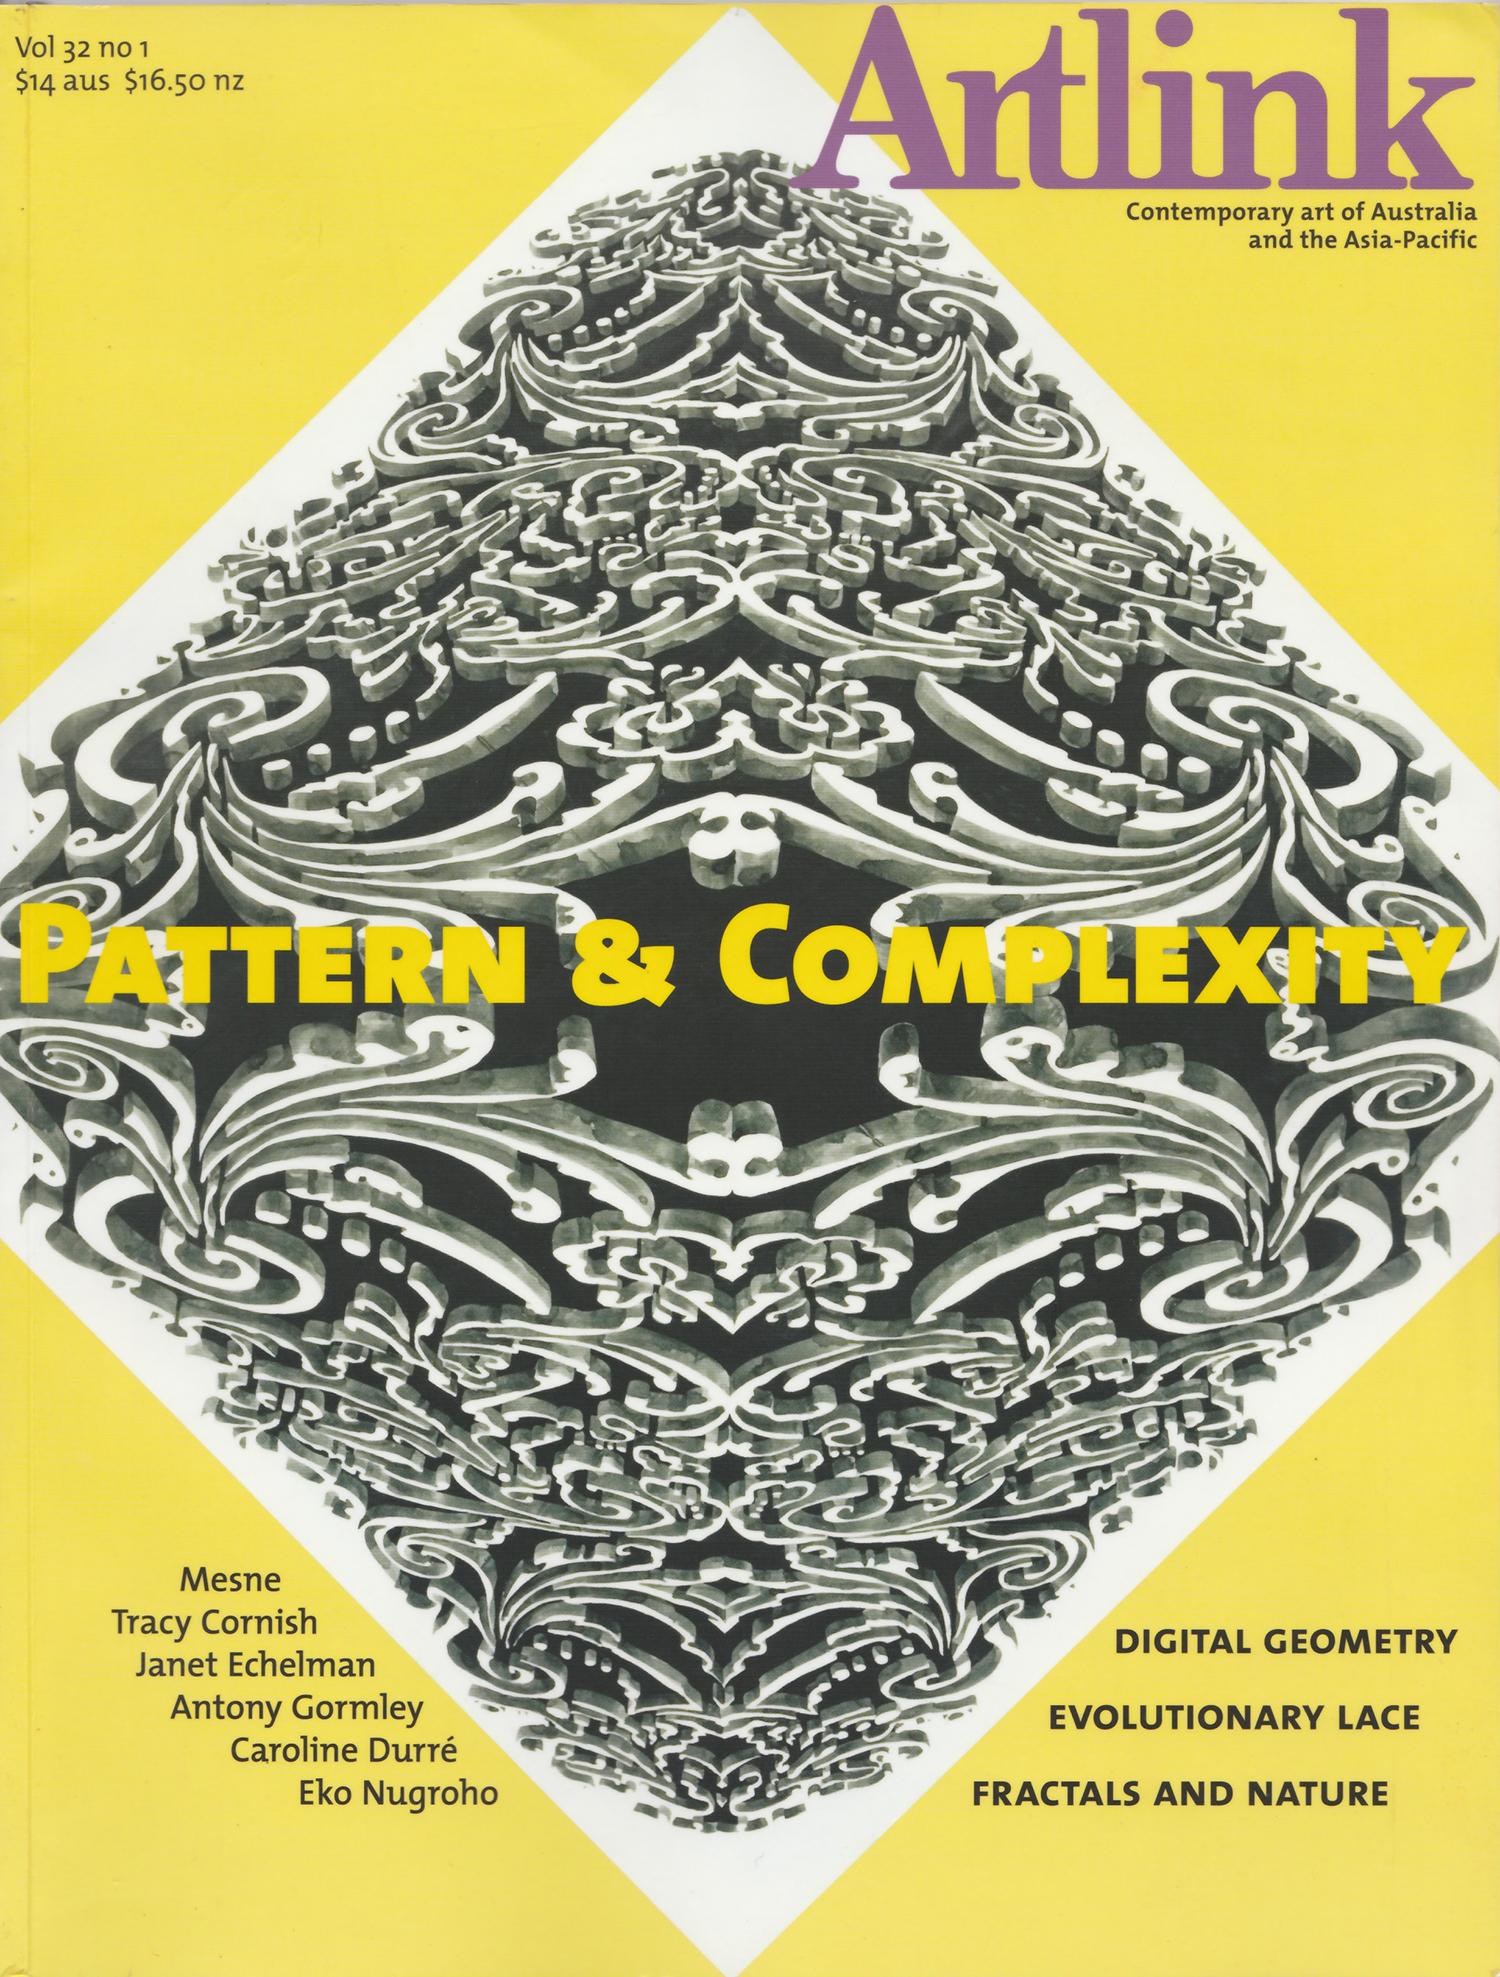 READ: Artlink 32/1 2012